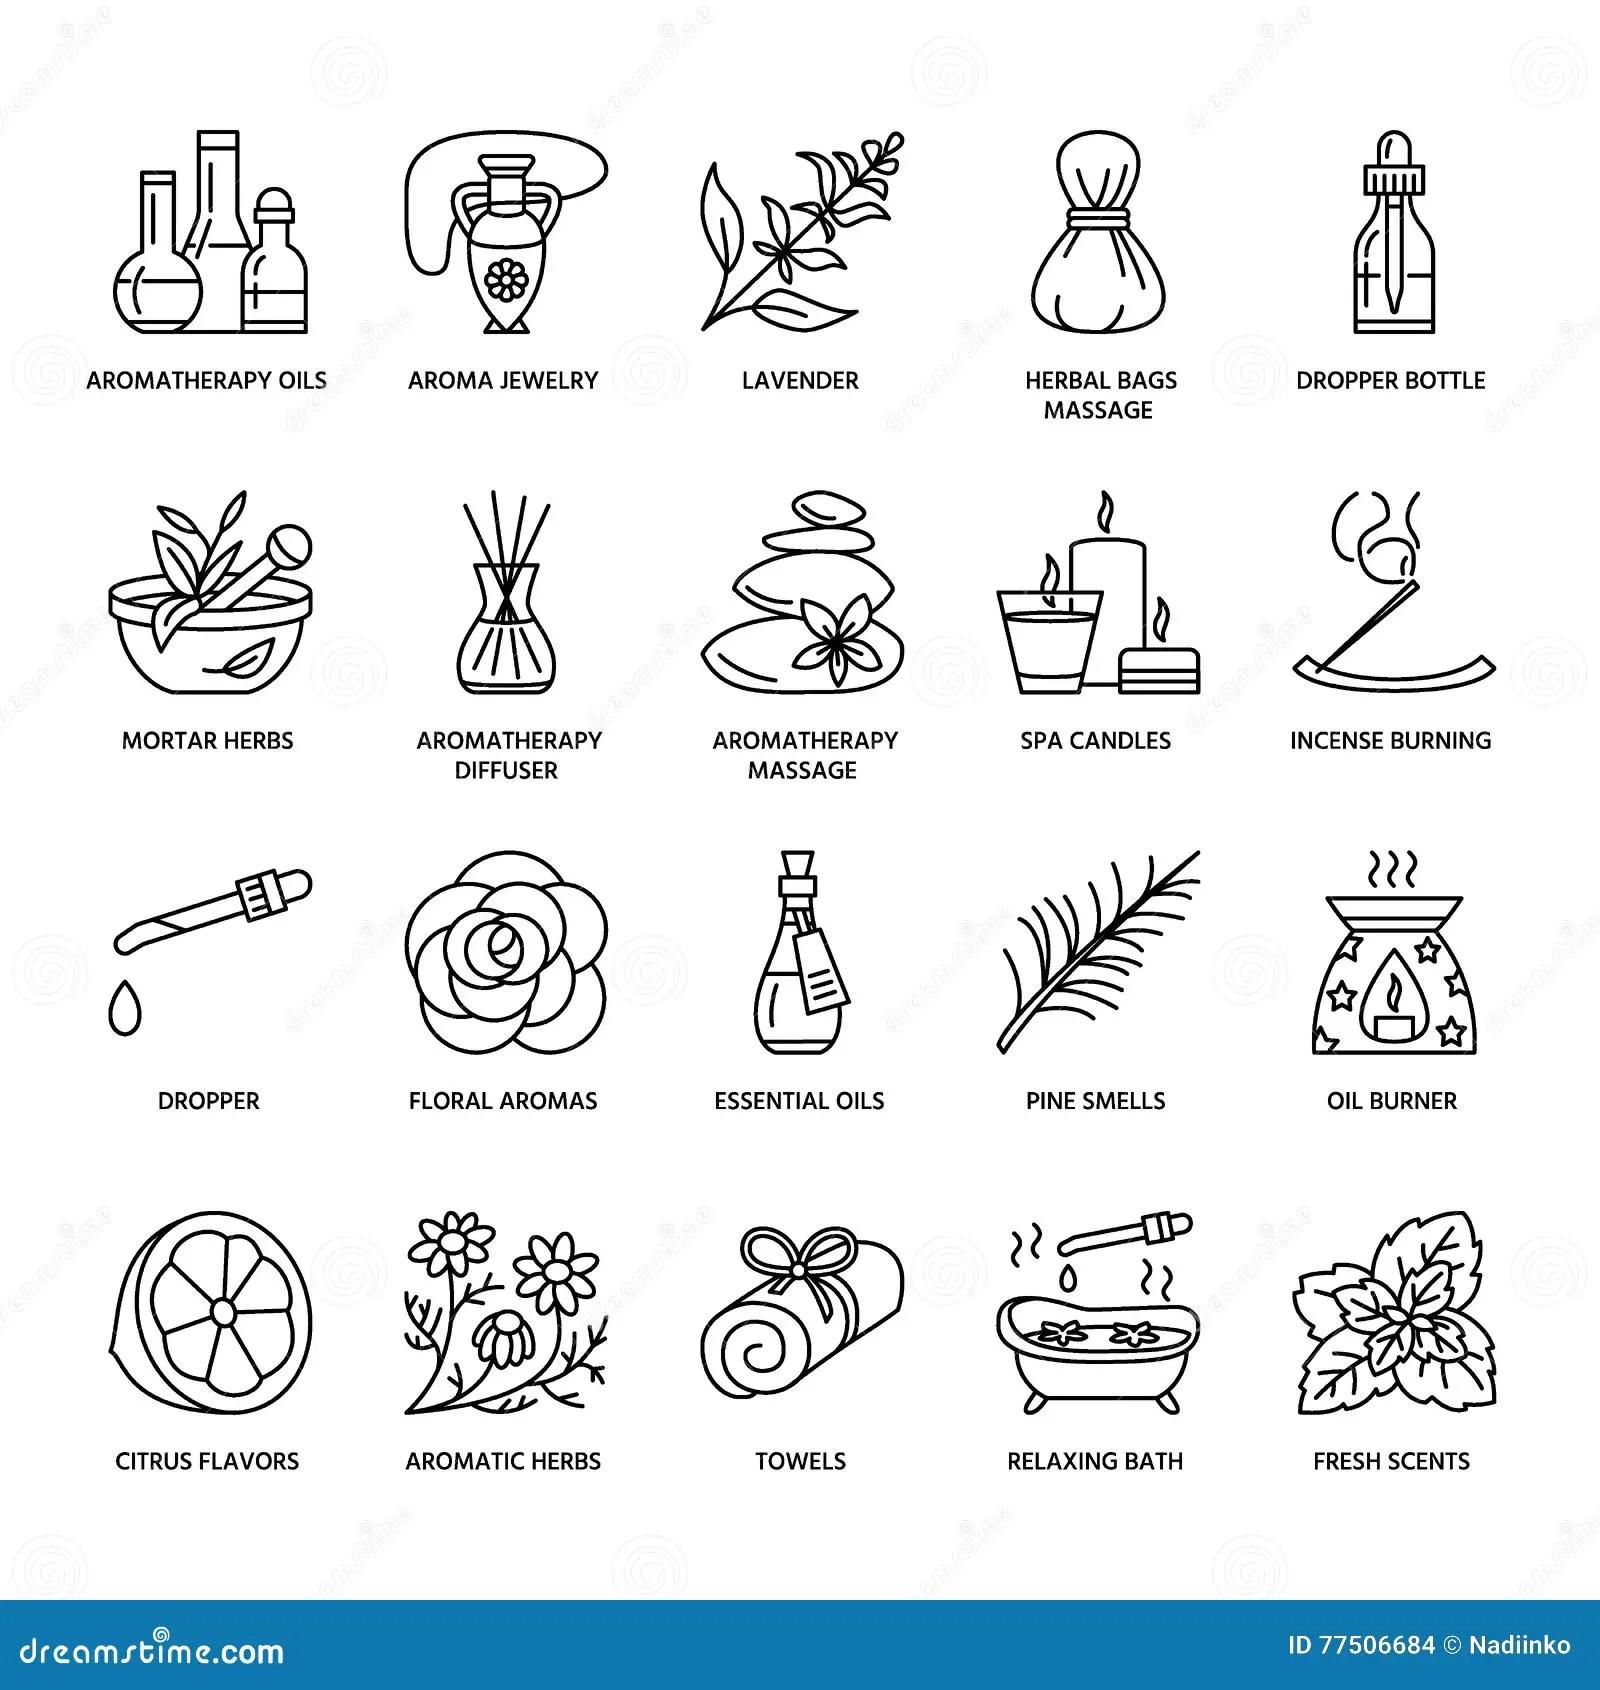 Diffuser Cartoons Illustrations Amp Vector Stock Images